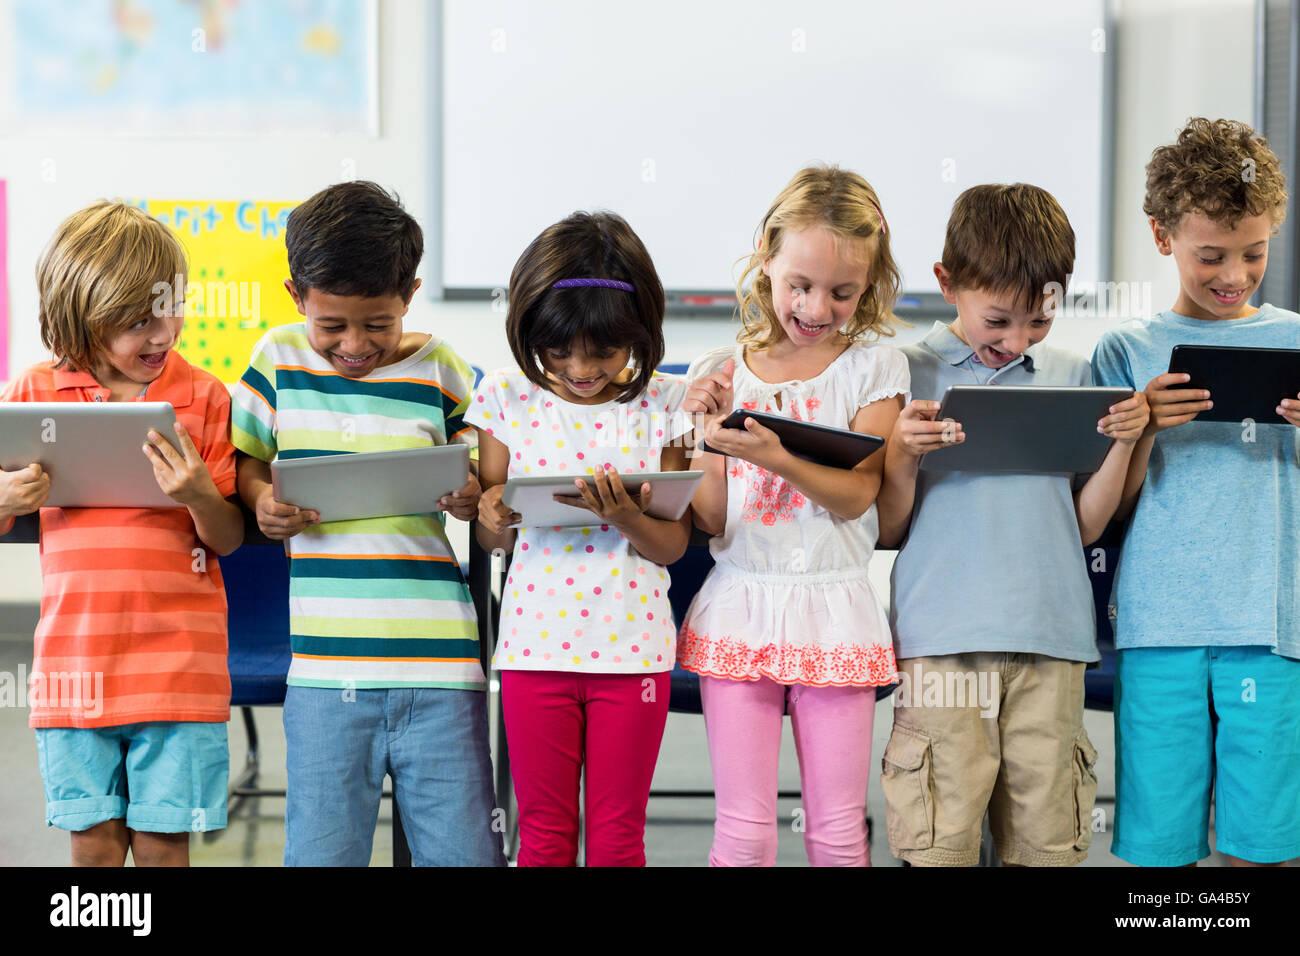 Smiling schoolchildren using digital tablet - Stock Image